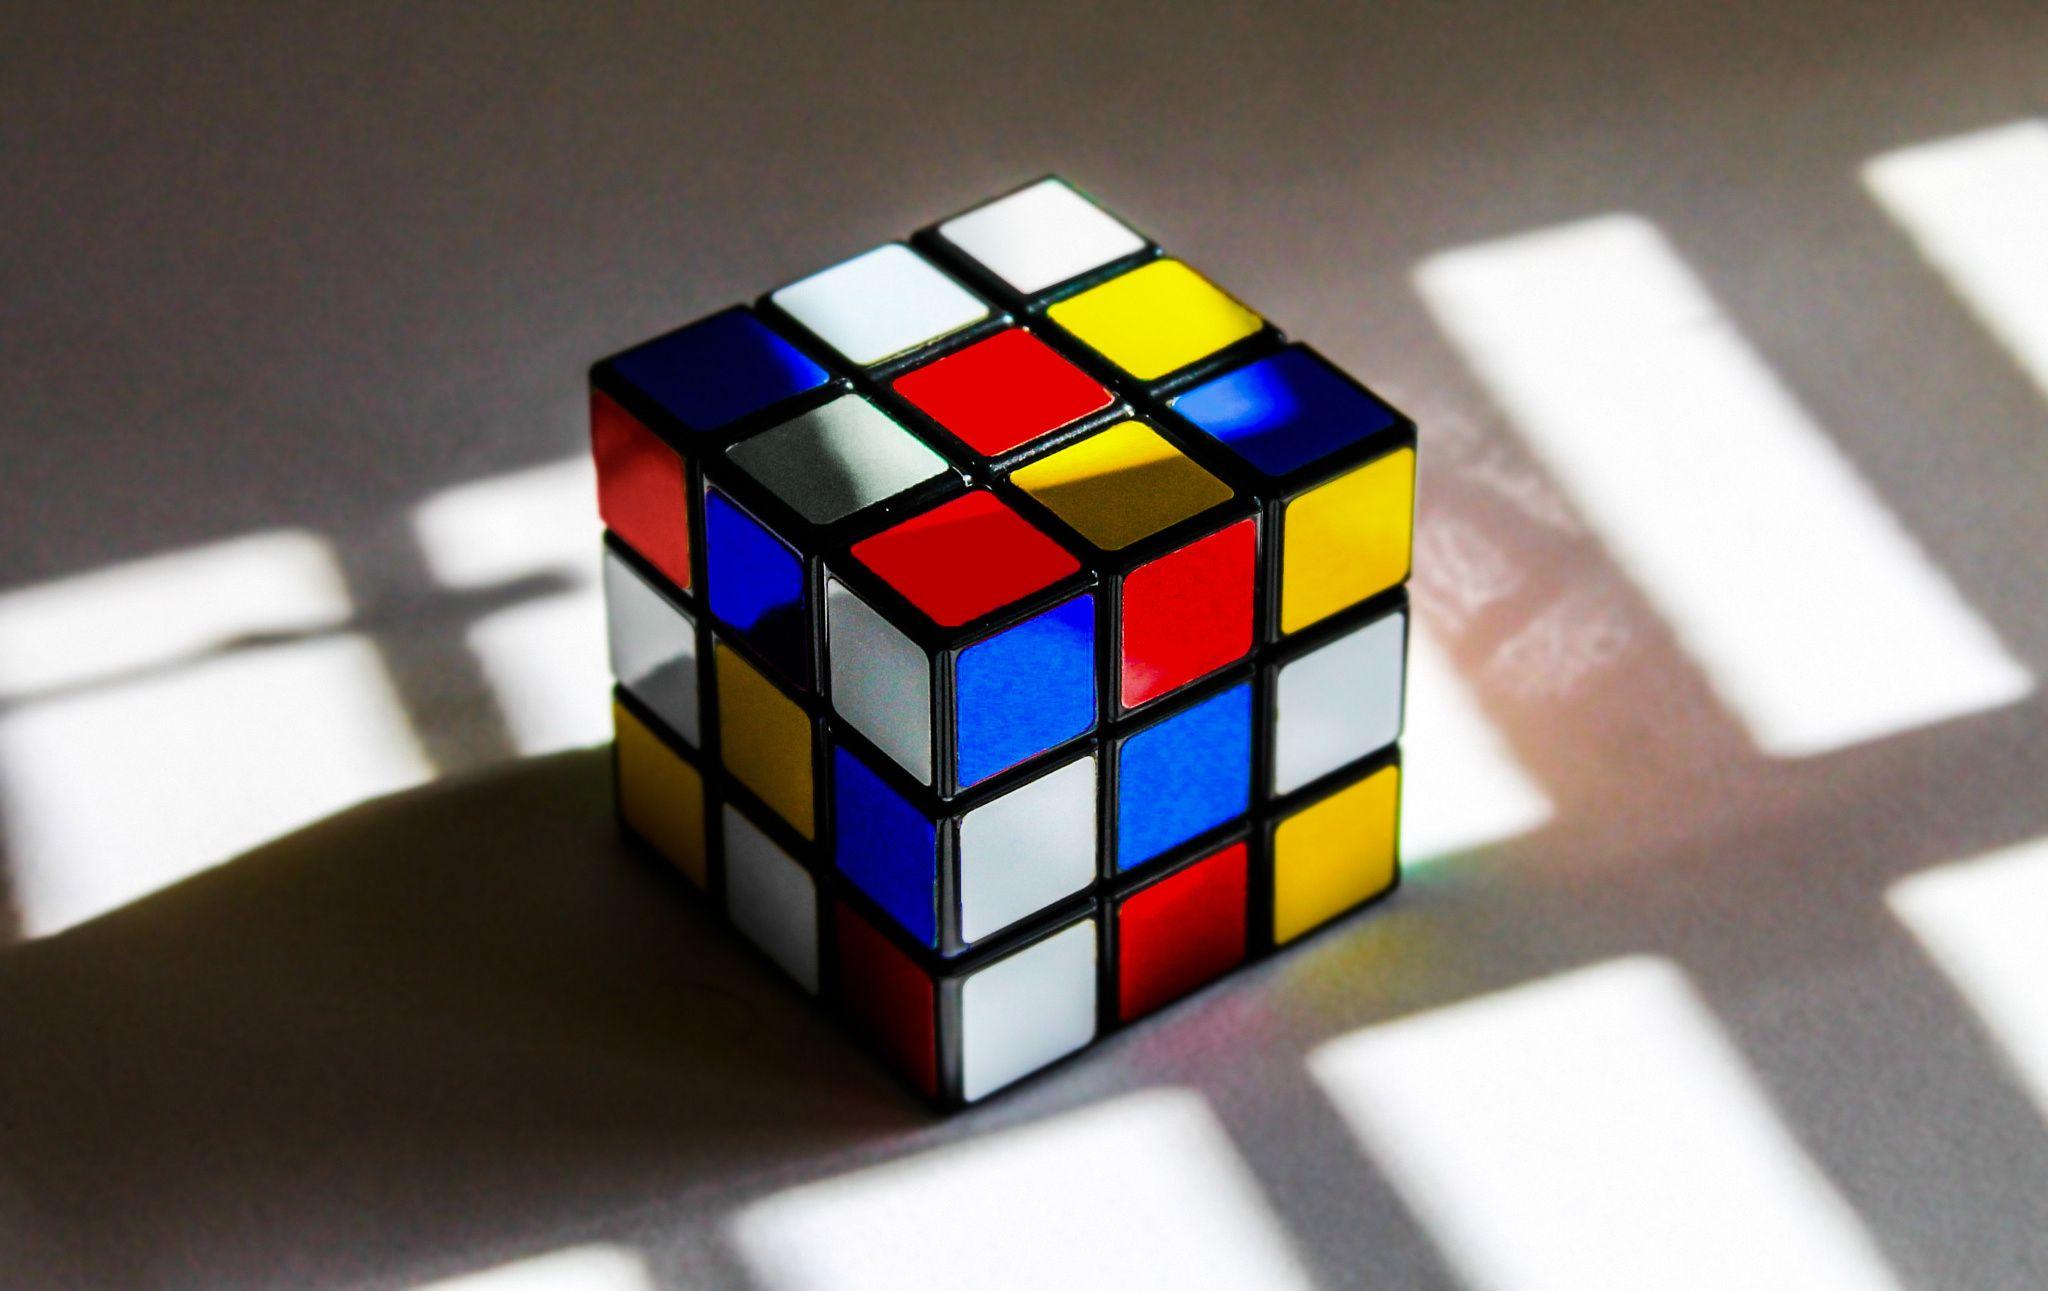 Mondrian Rubik's Cube. by Beatrice  on 500px